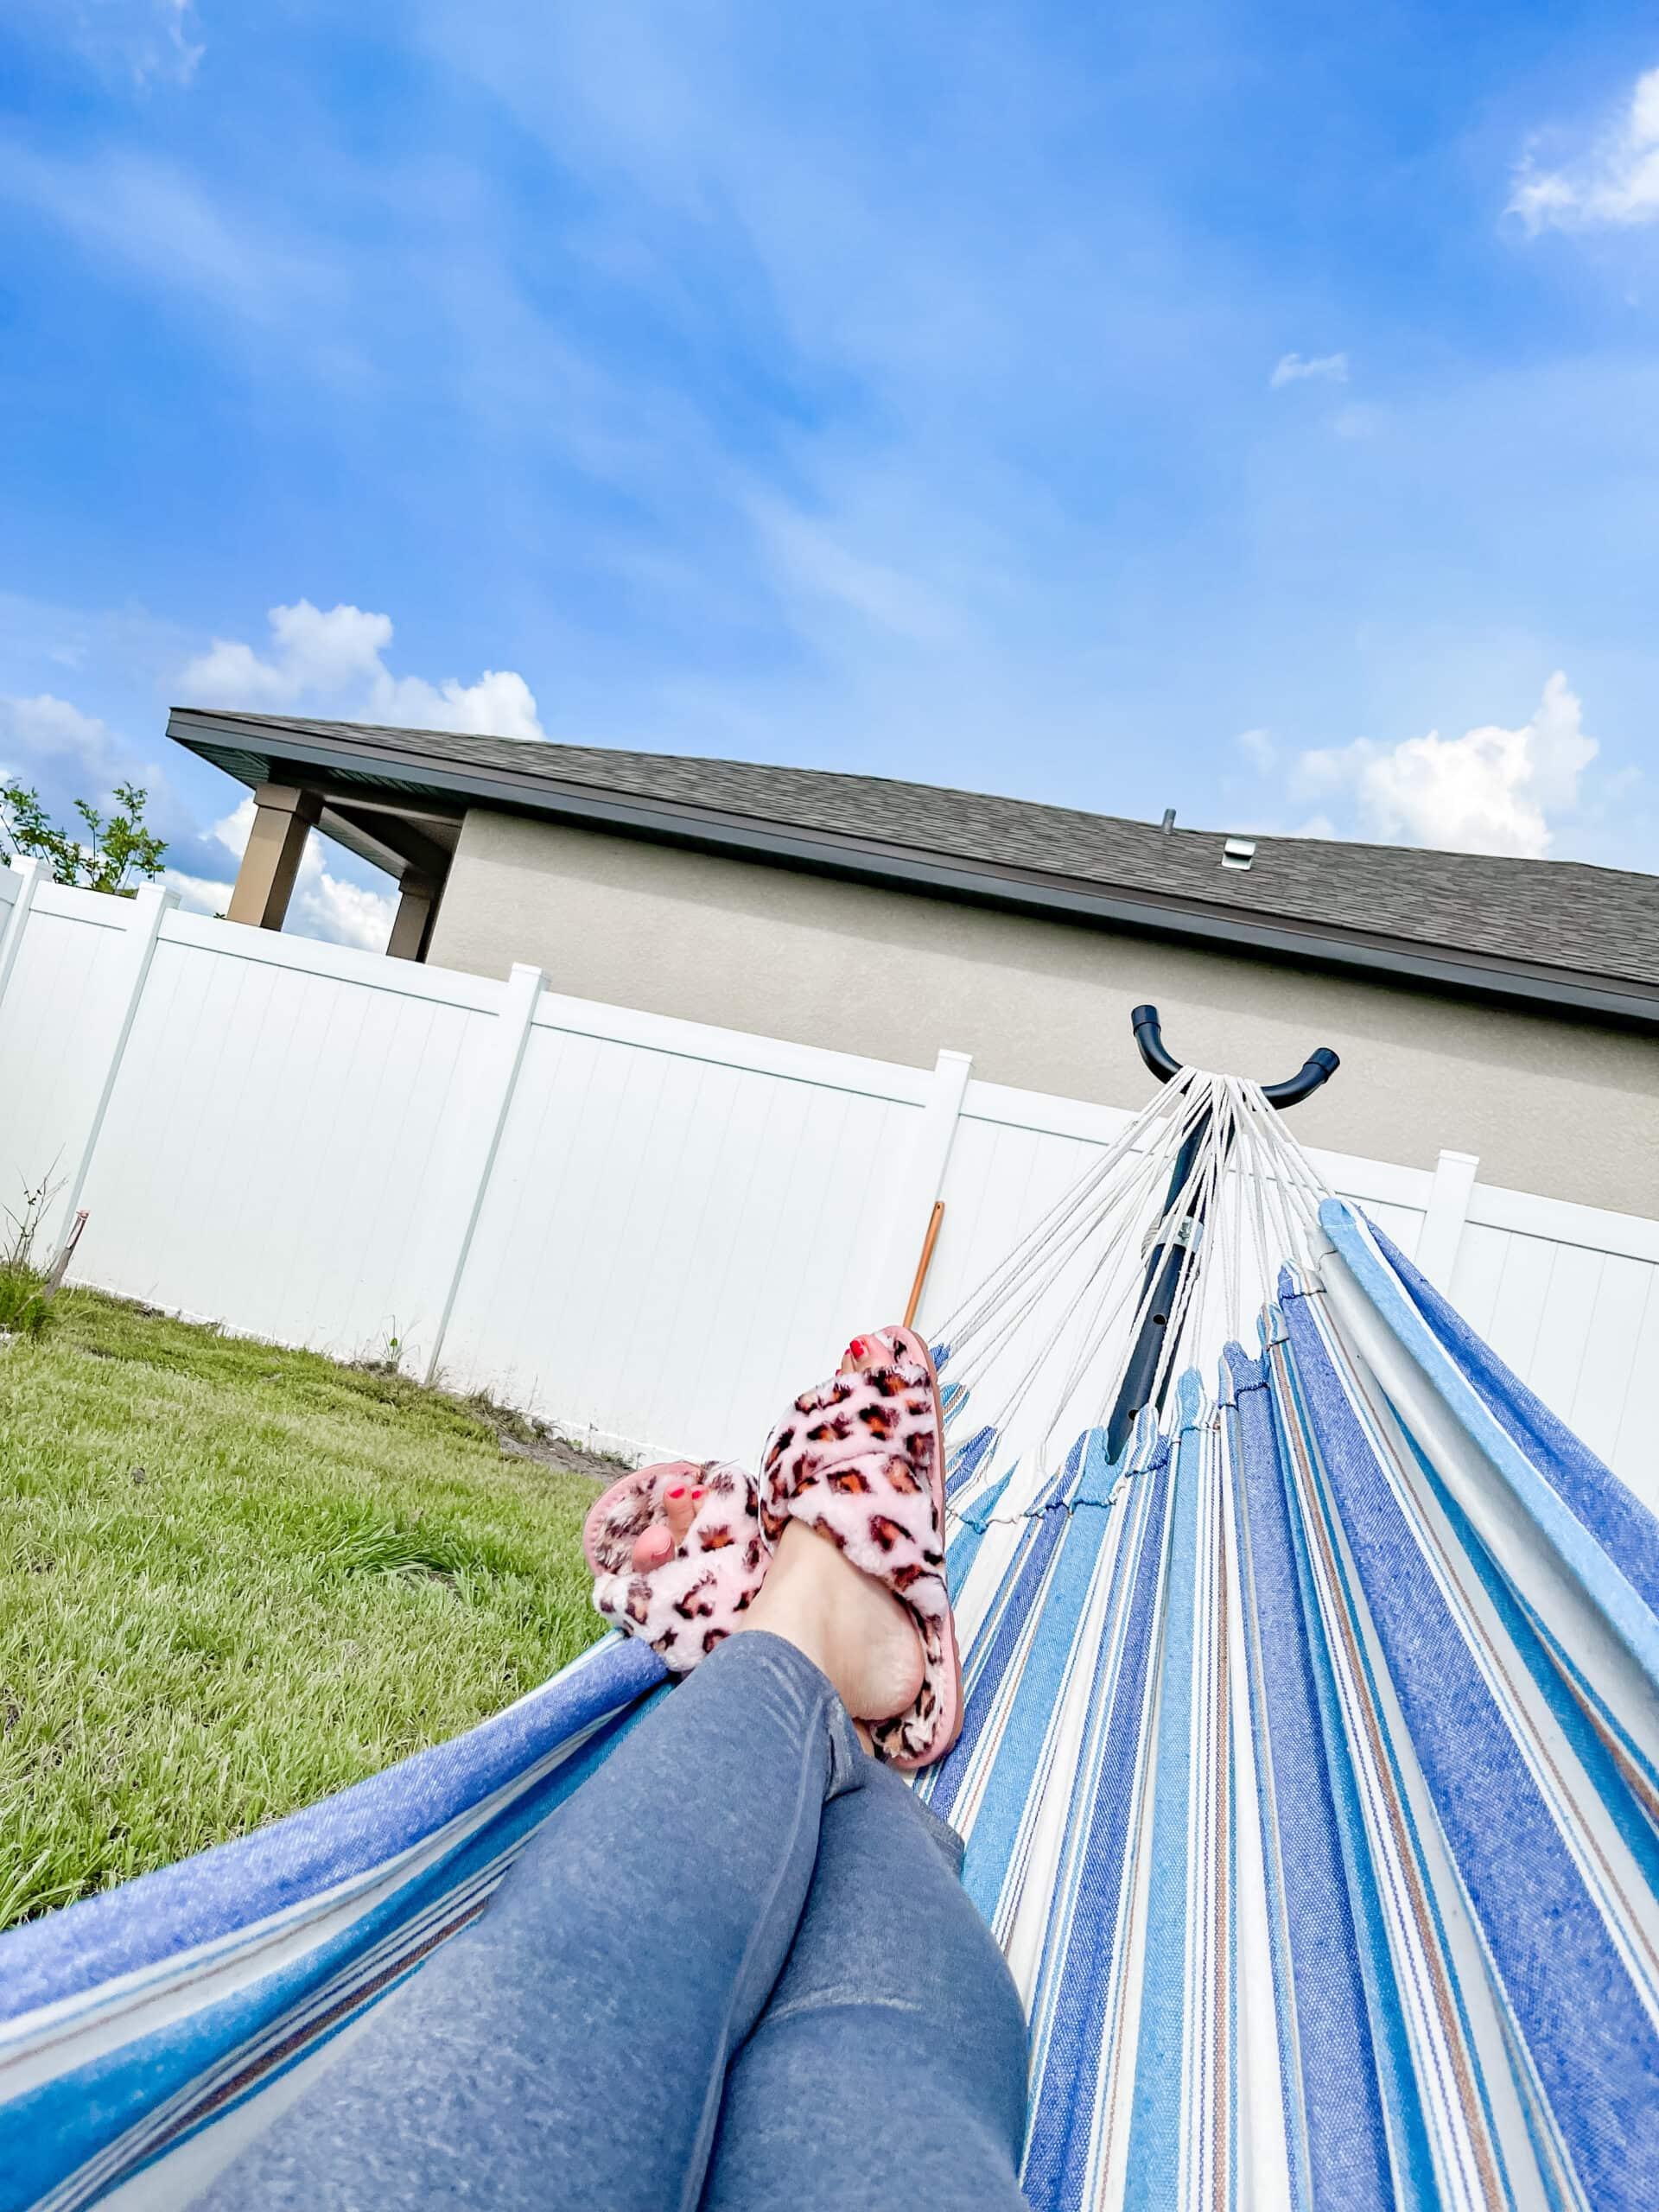 How to Make Your Backyard Amazing With Sunnydaze Decor